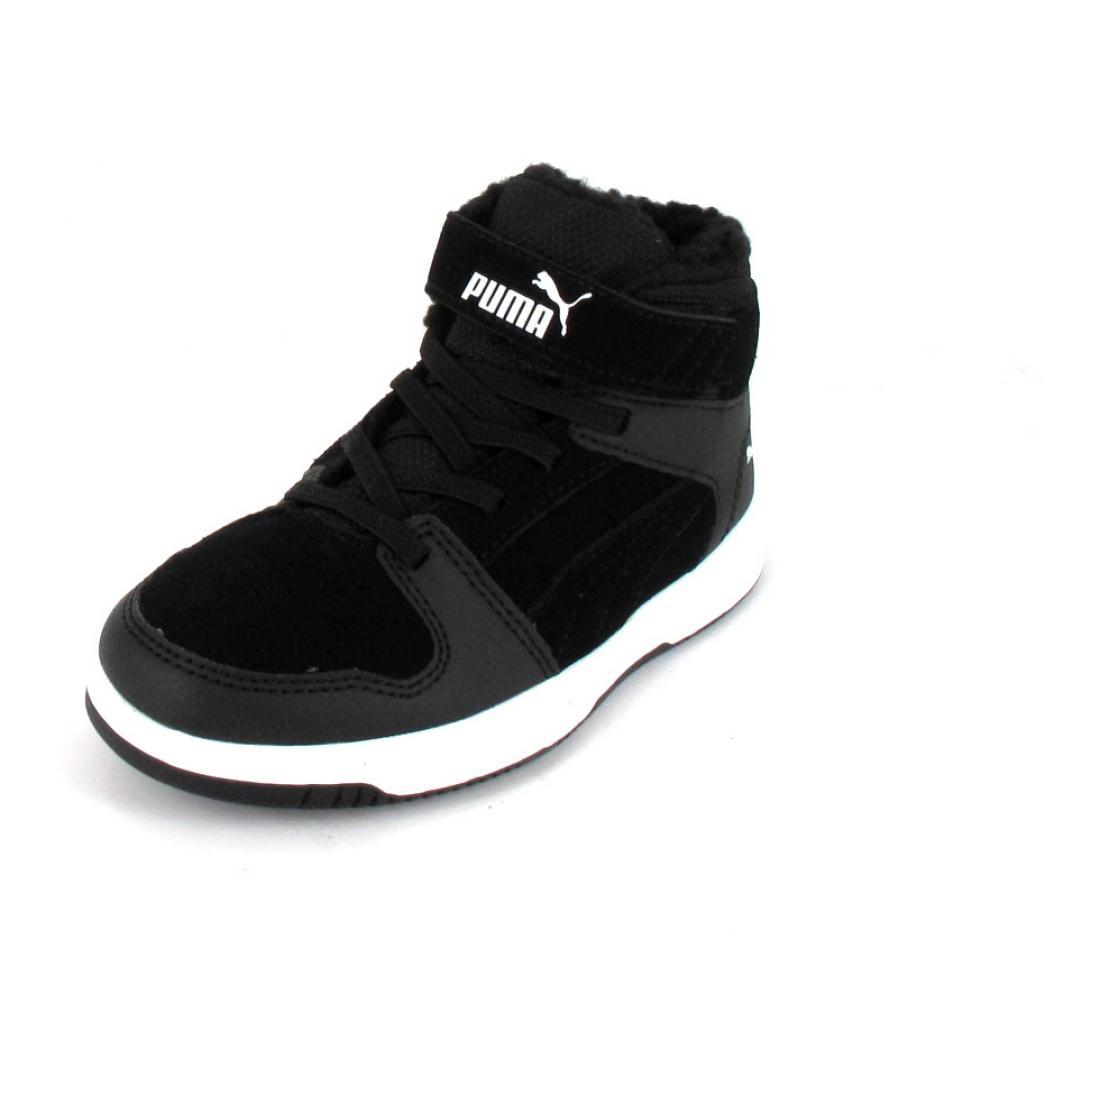 Puma Sneaker Rebound Layup Fur SD